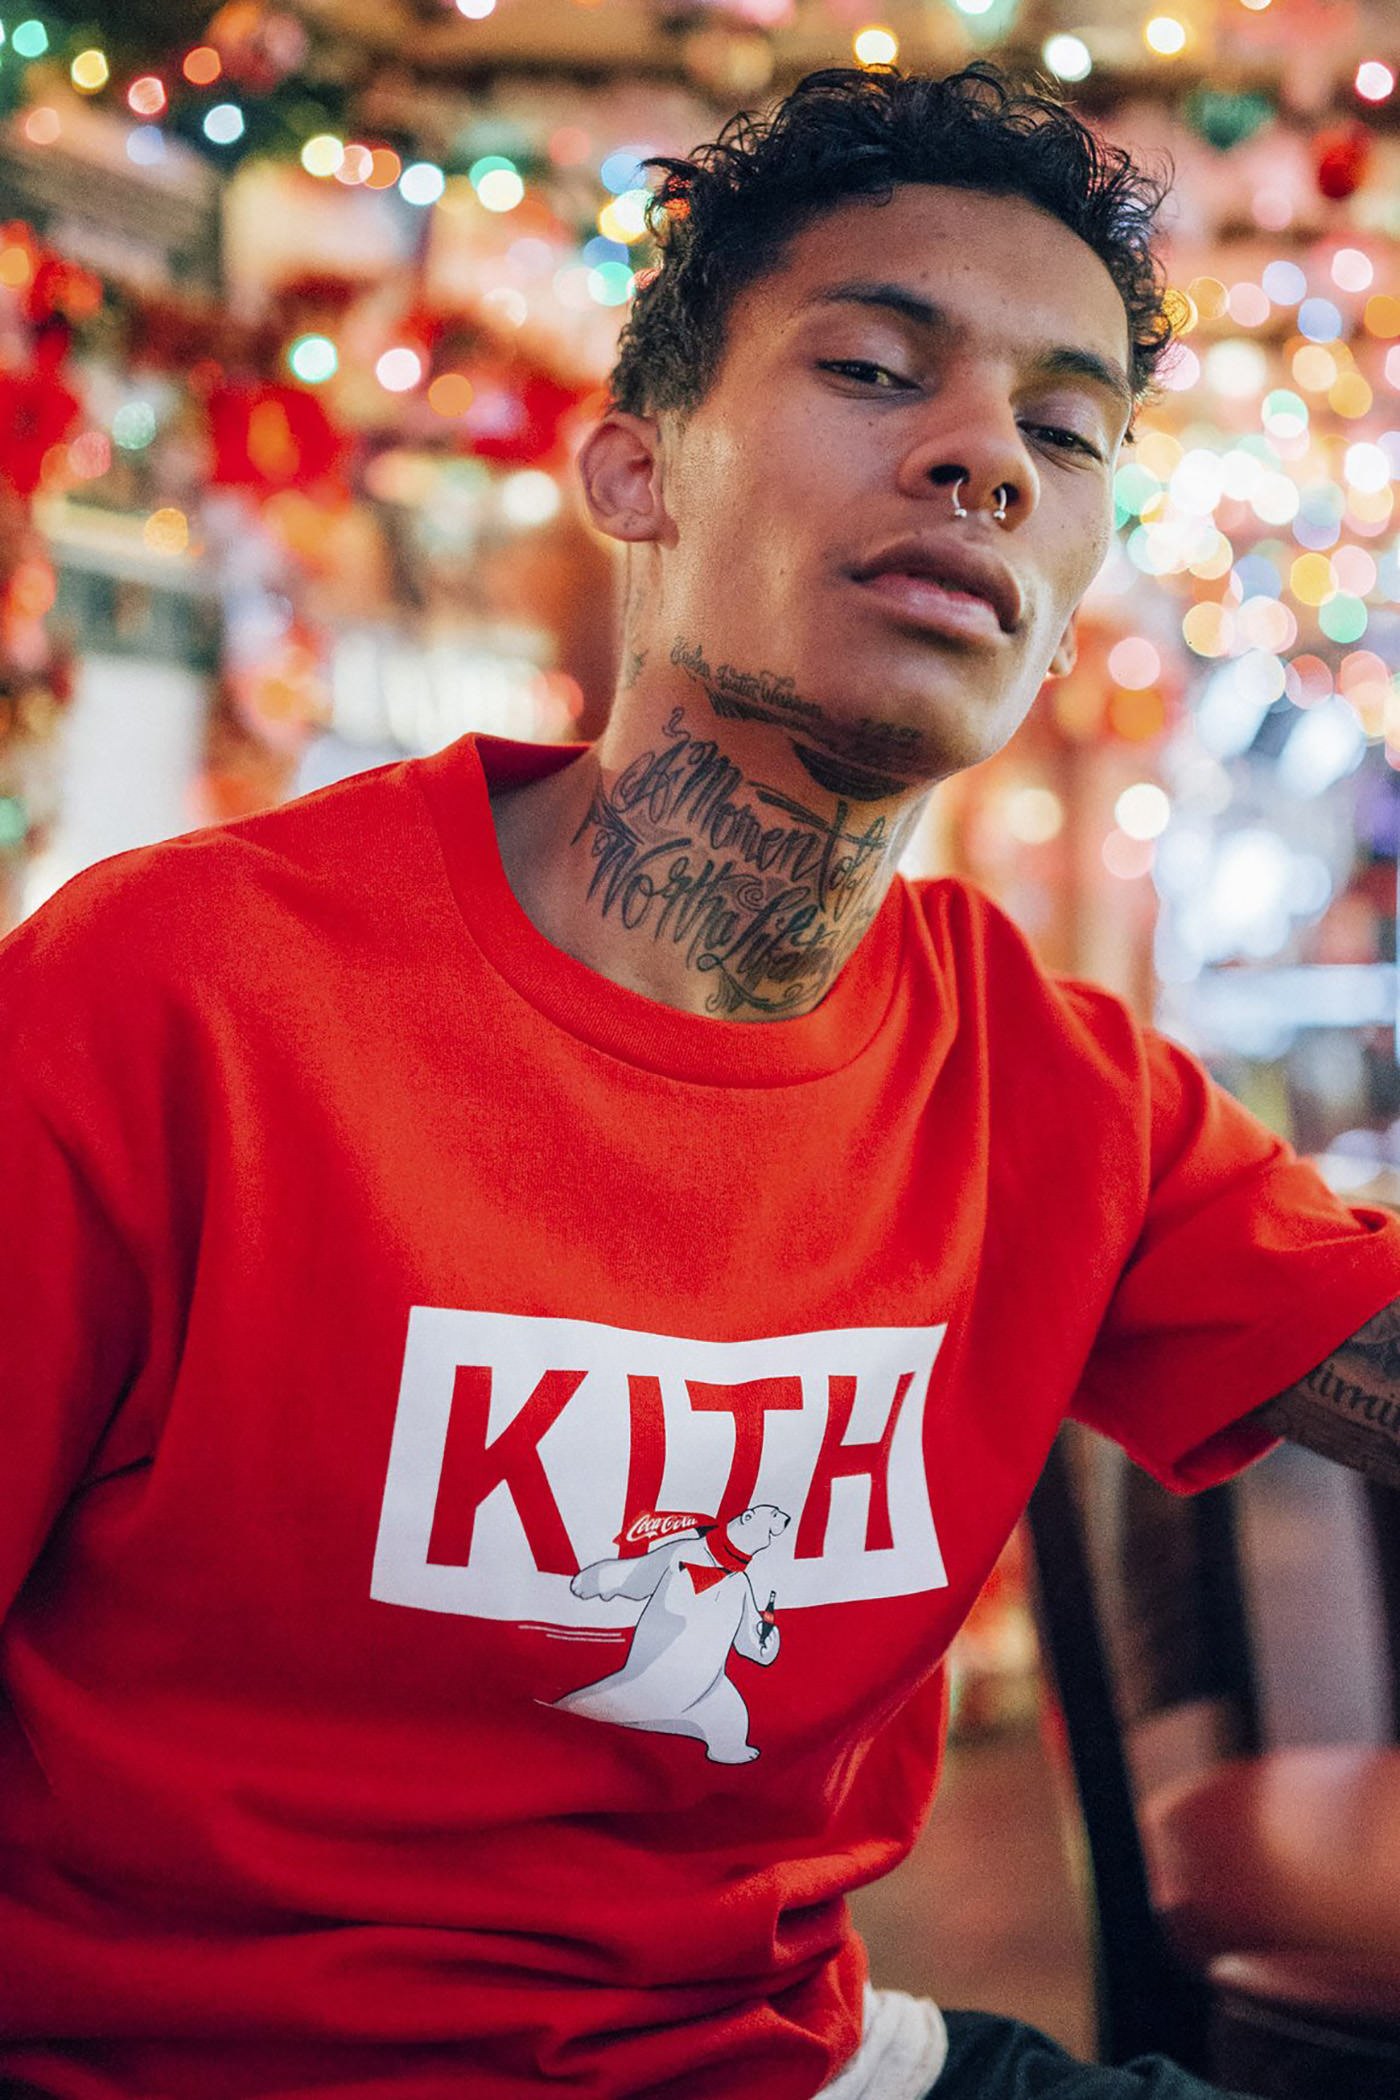 kith-coca-cola-collab-016